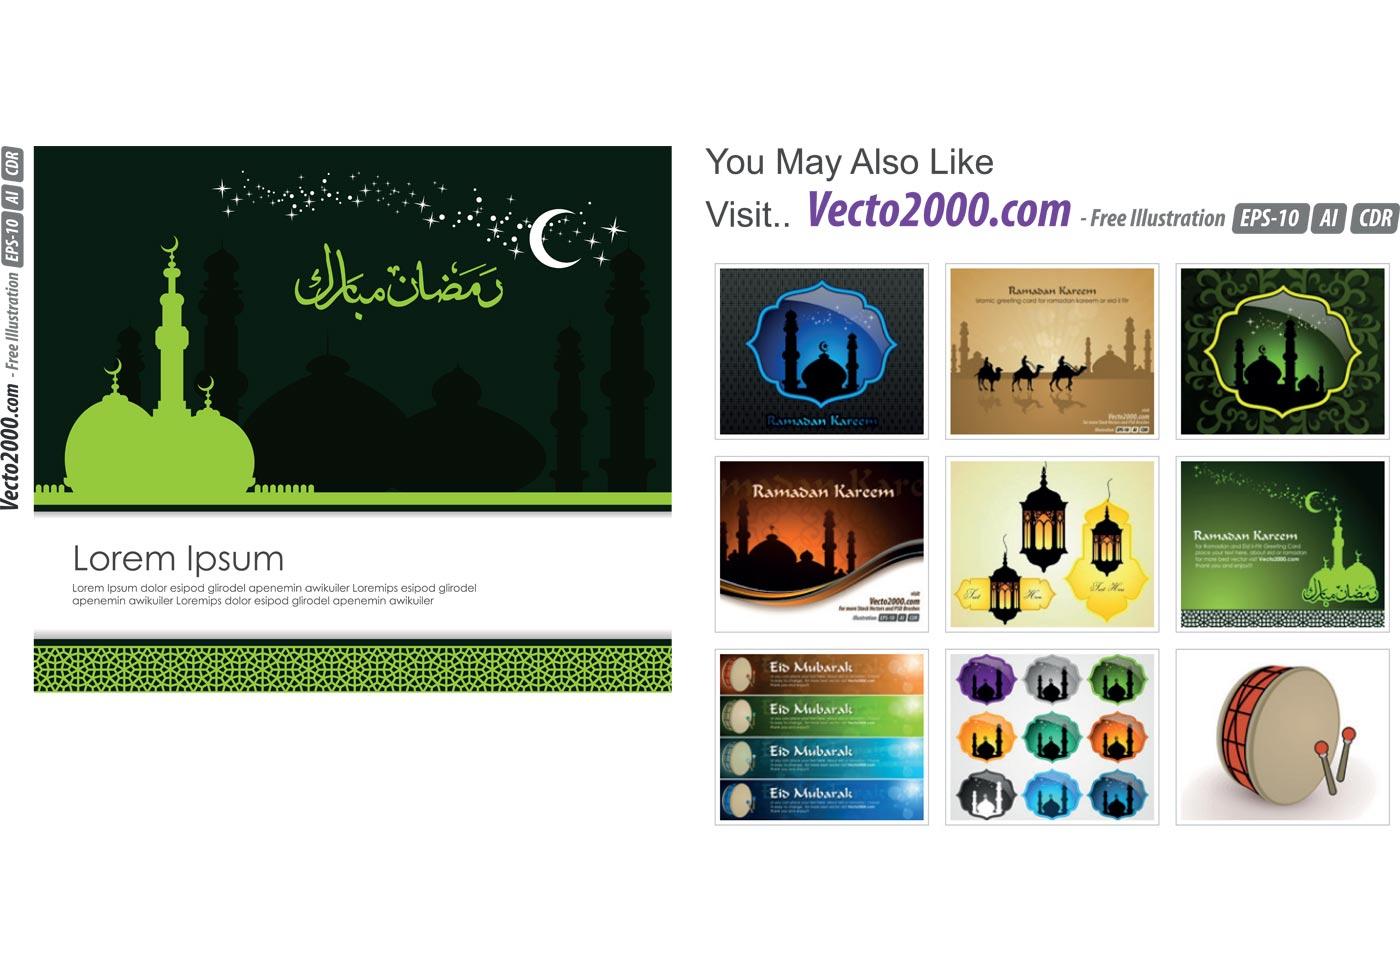 islamic greeting card template for ramadan kareem or eidilfitr